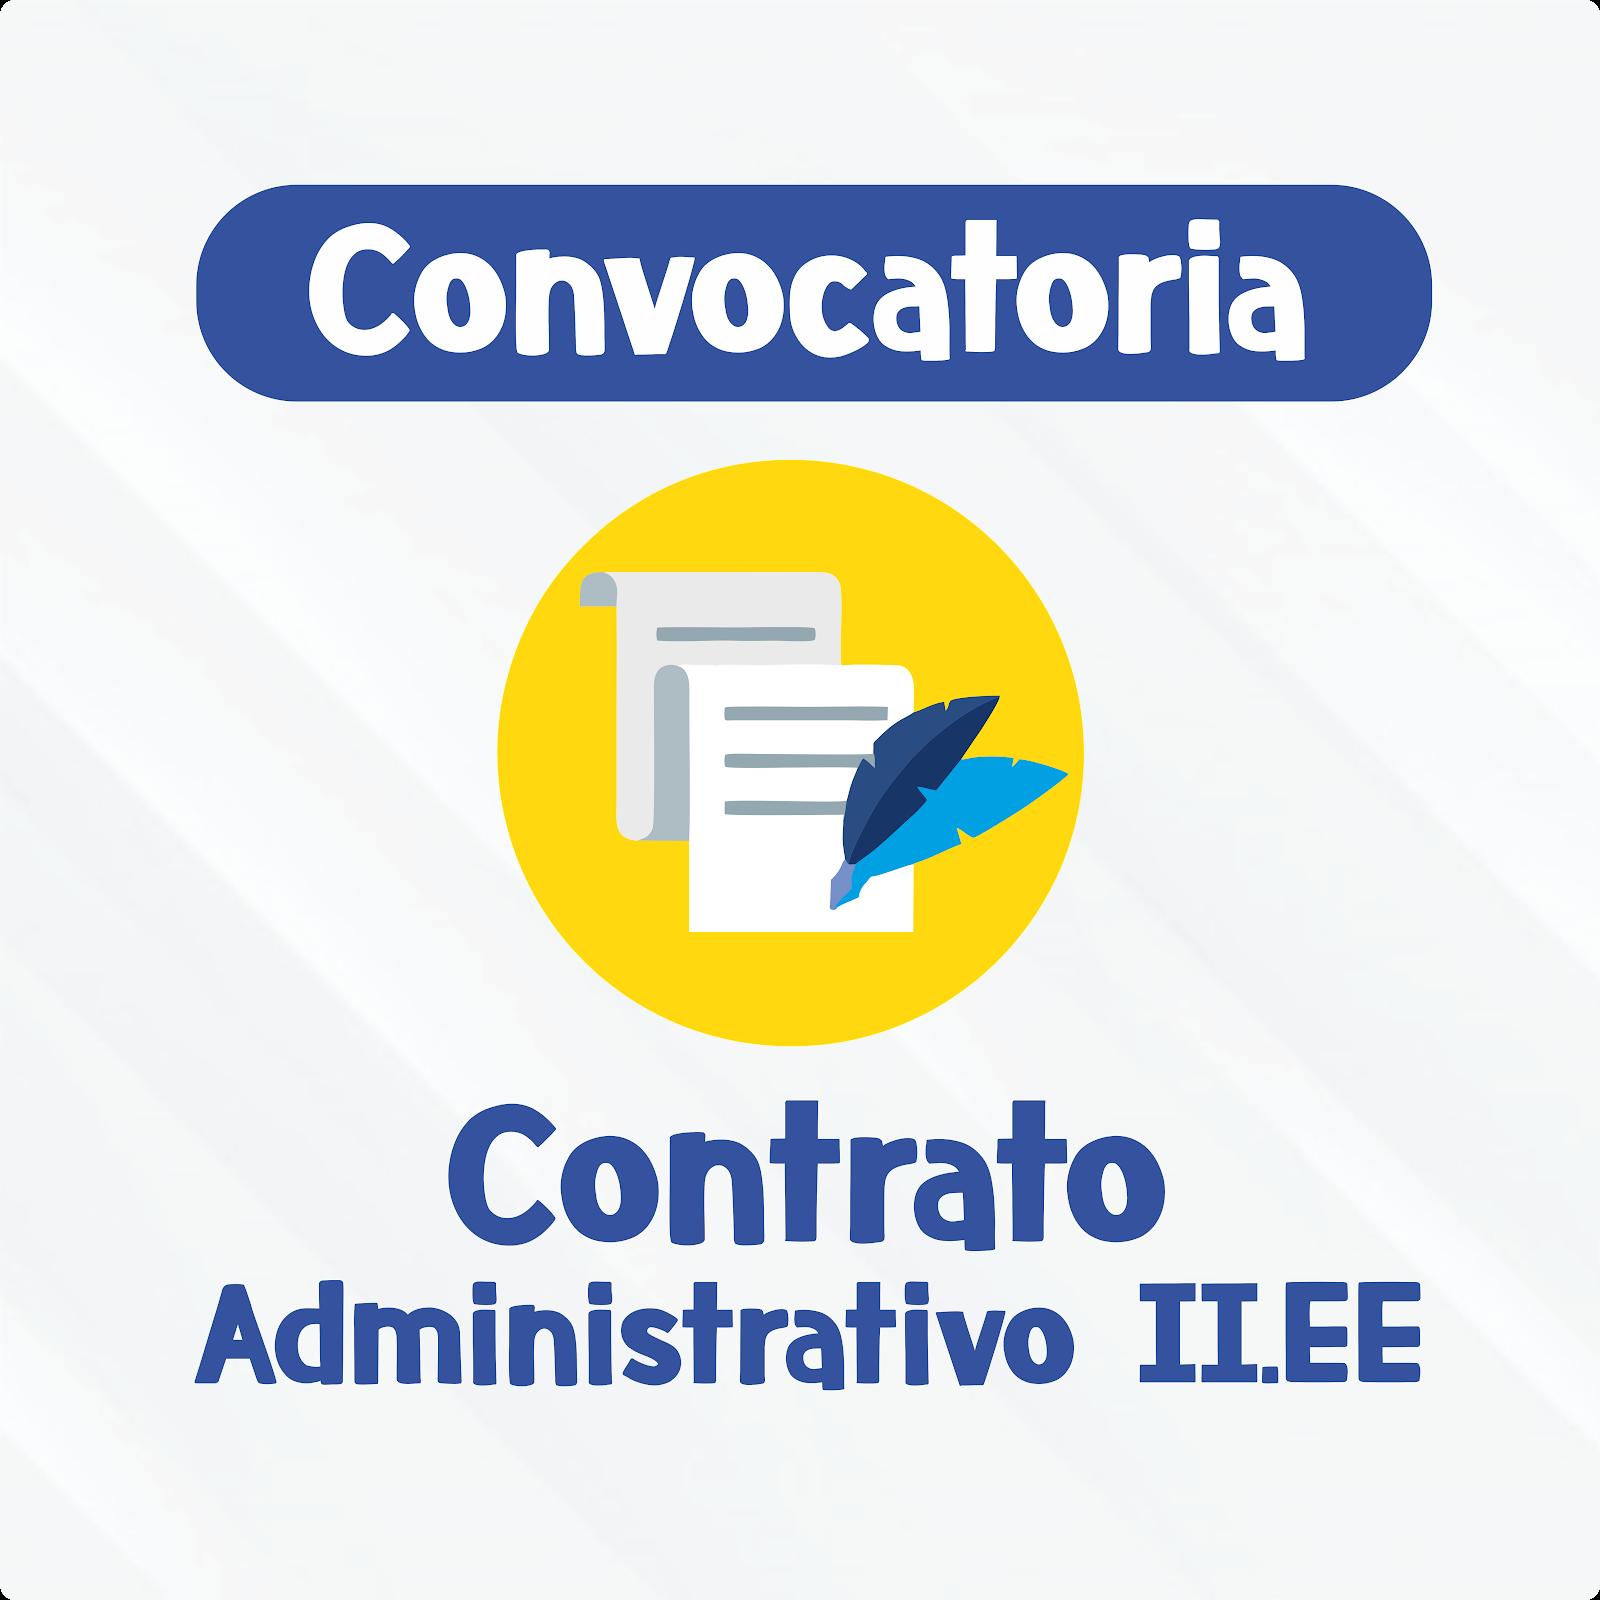 CONVOCATORIA ADMINISTRATIVA II.EE